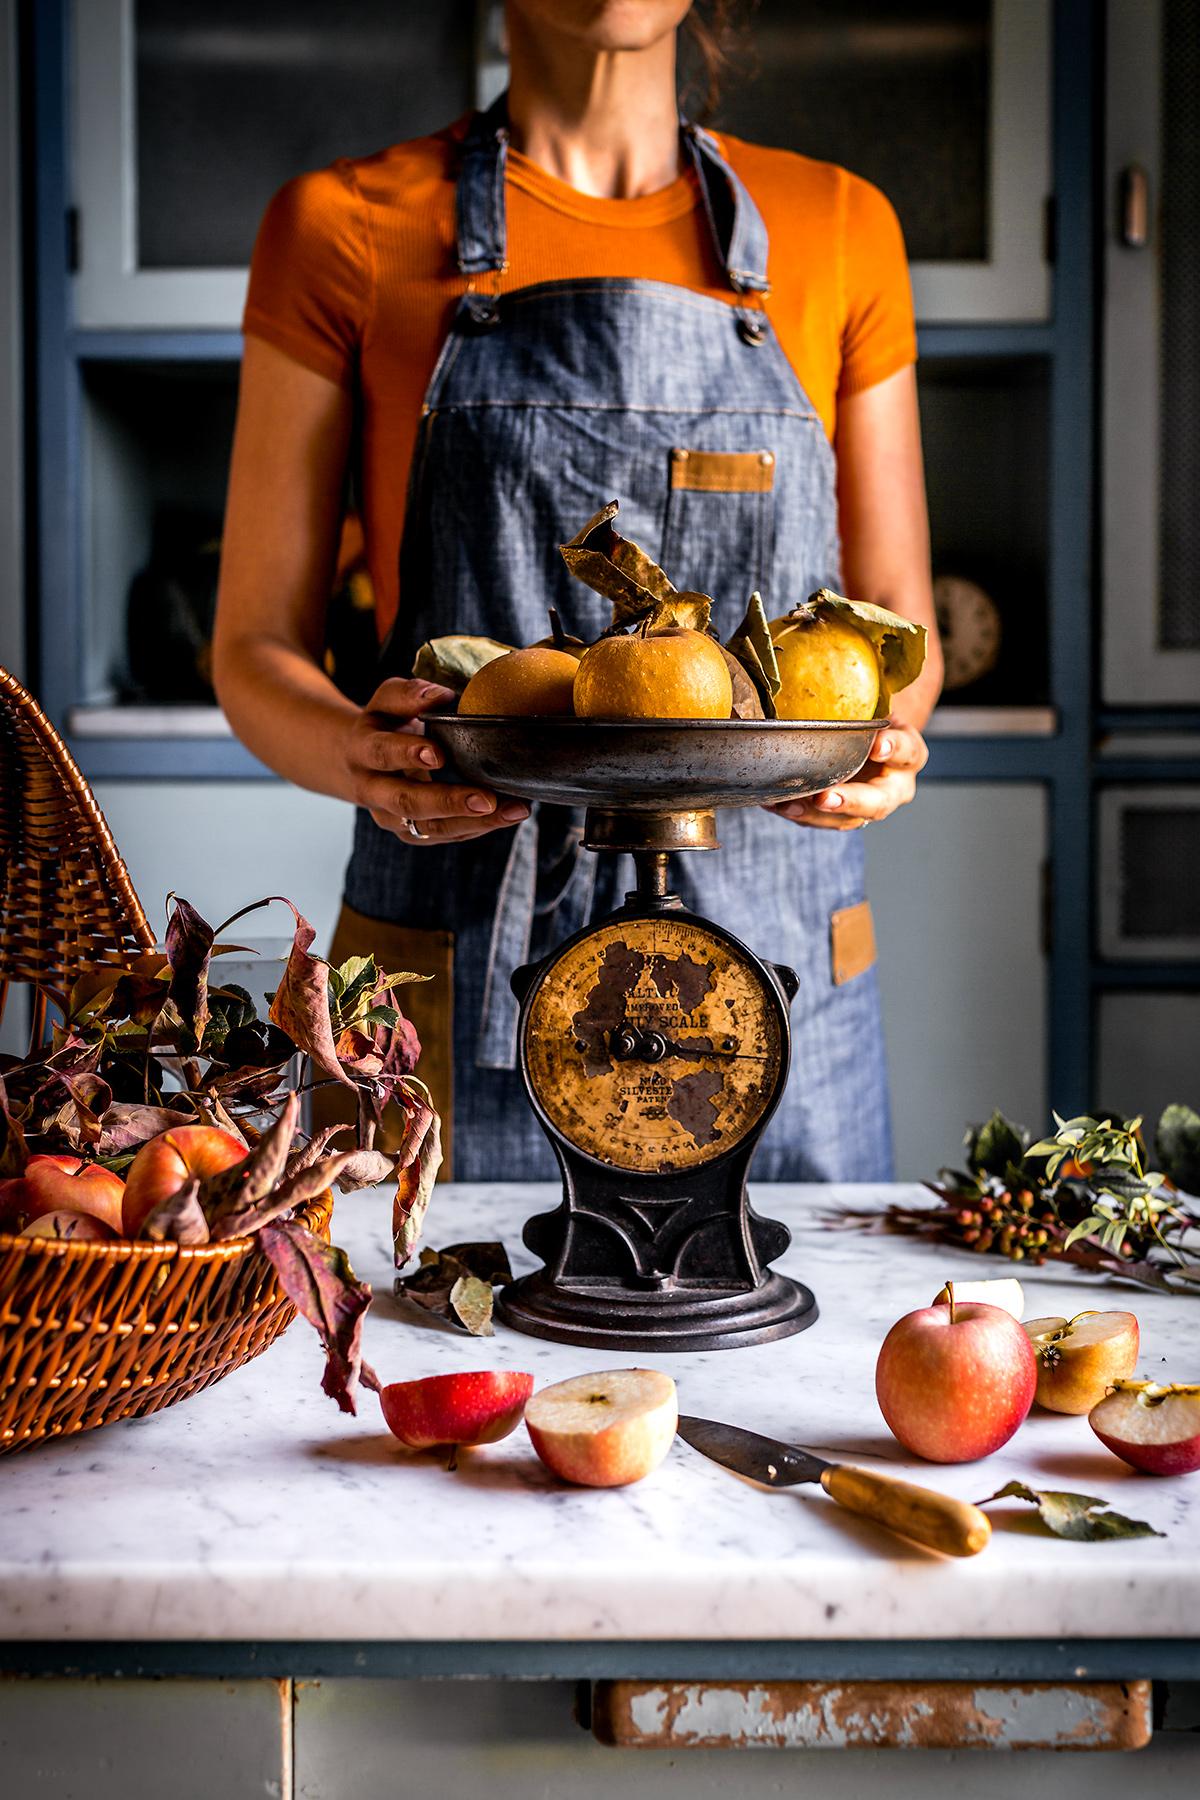 FOOD PHOTOGRAPHY ricetta PANCAKES VEGAN di GRANO SARACENO e MELE SENZA GLUTINE con mele caramellate cranberry e datteri gluten-free VEGAN APPLE BUCKWHEAT PANCAKES